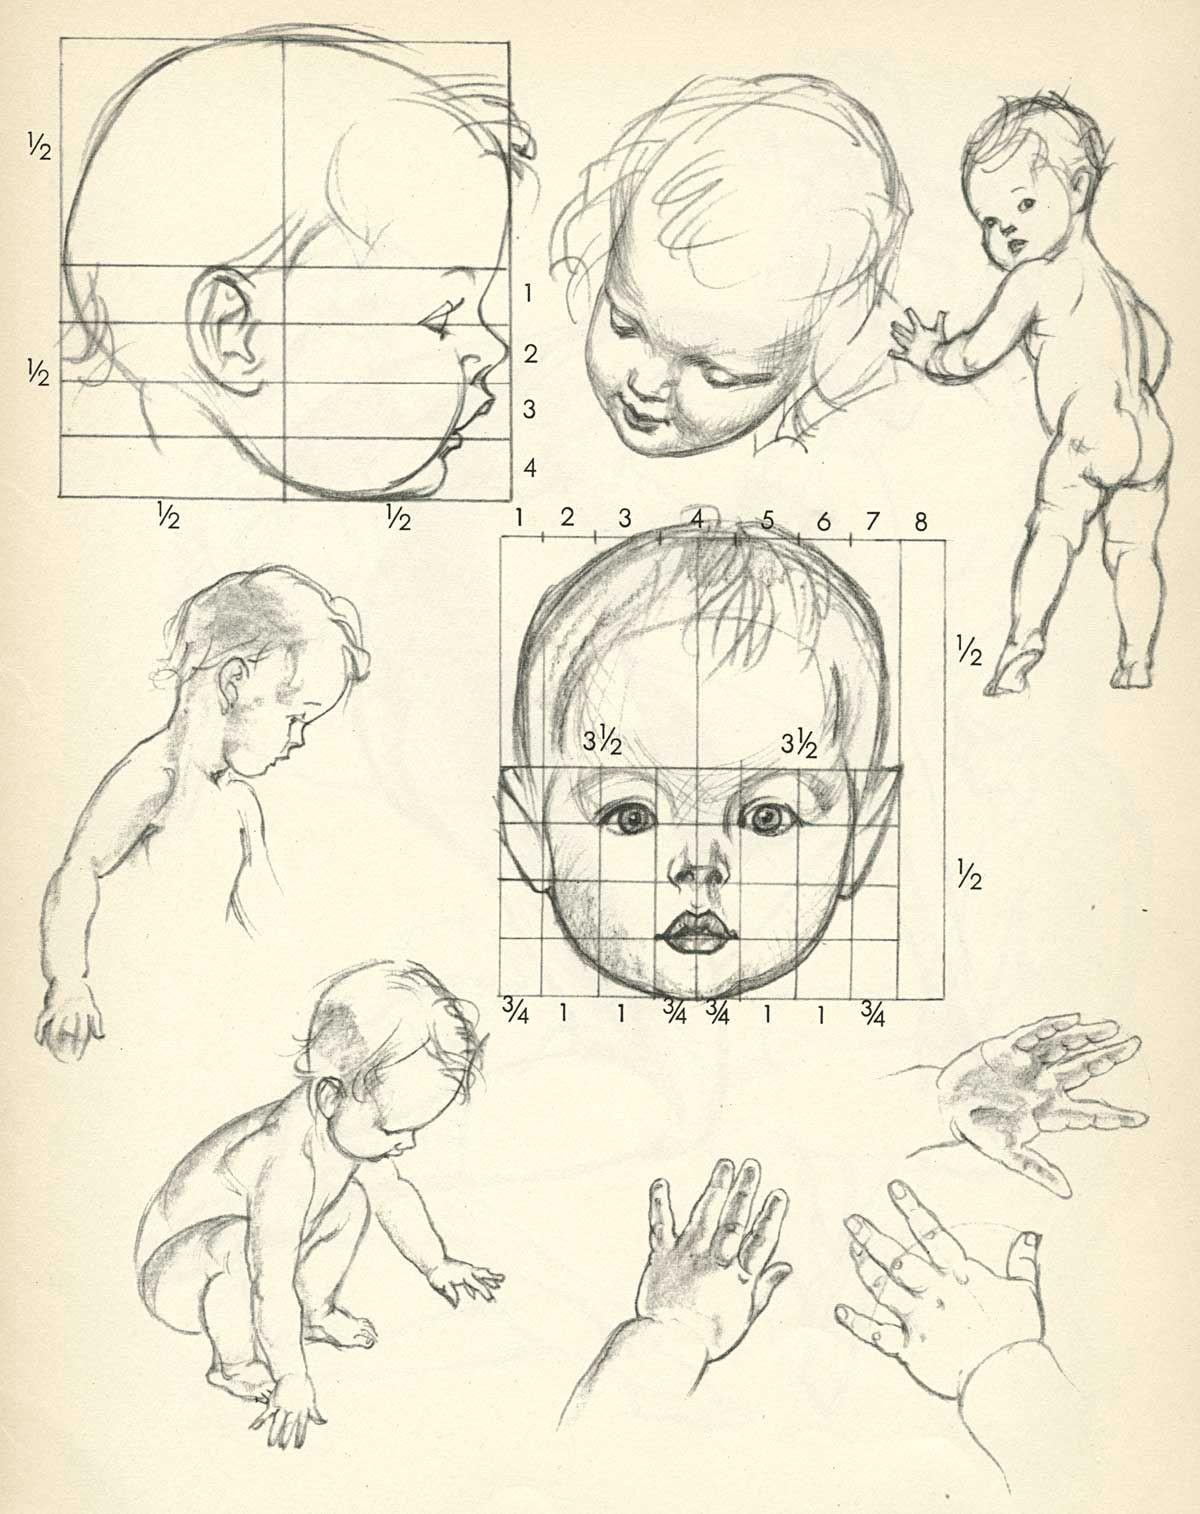 bebes mas anatomy drawing kids drawing lessons children drawing drawing women toddler